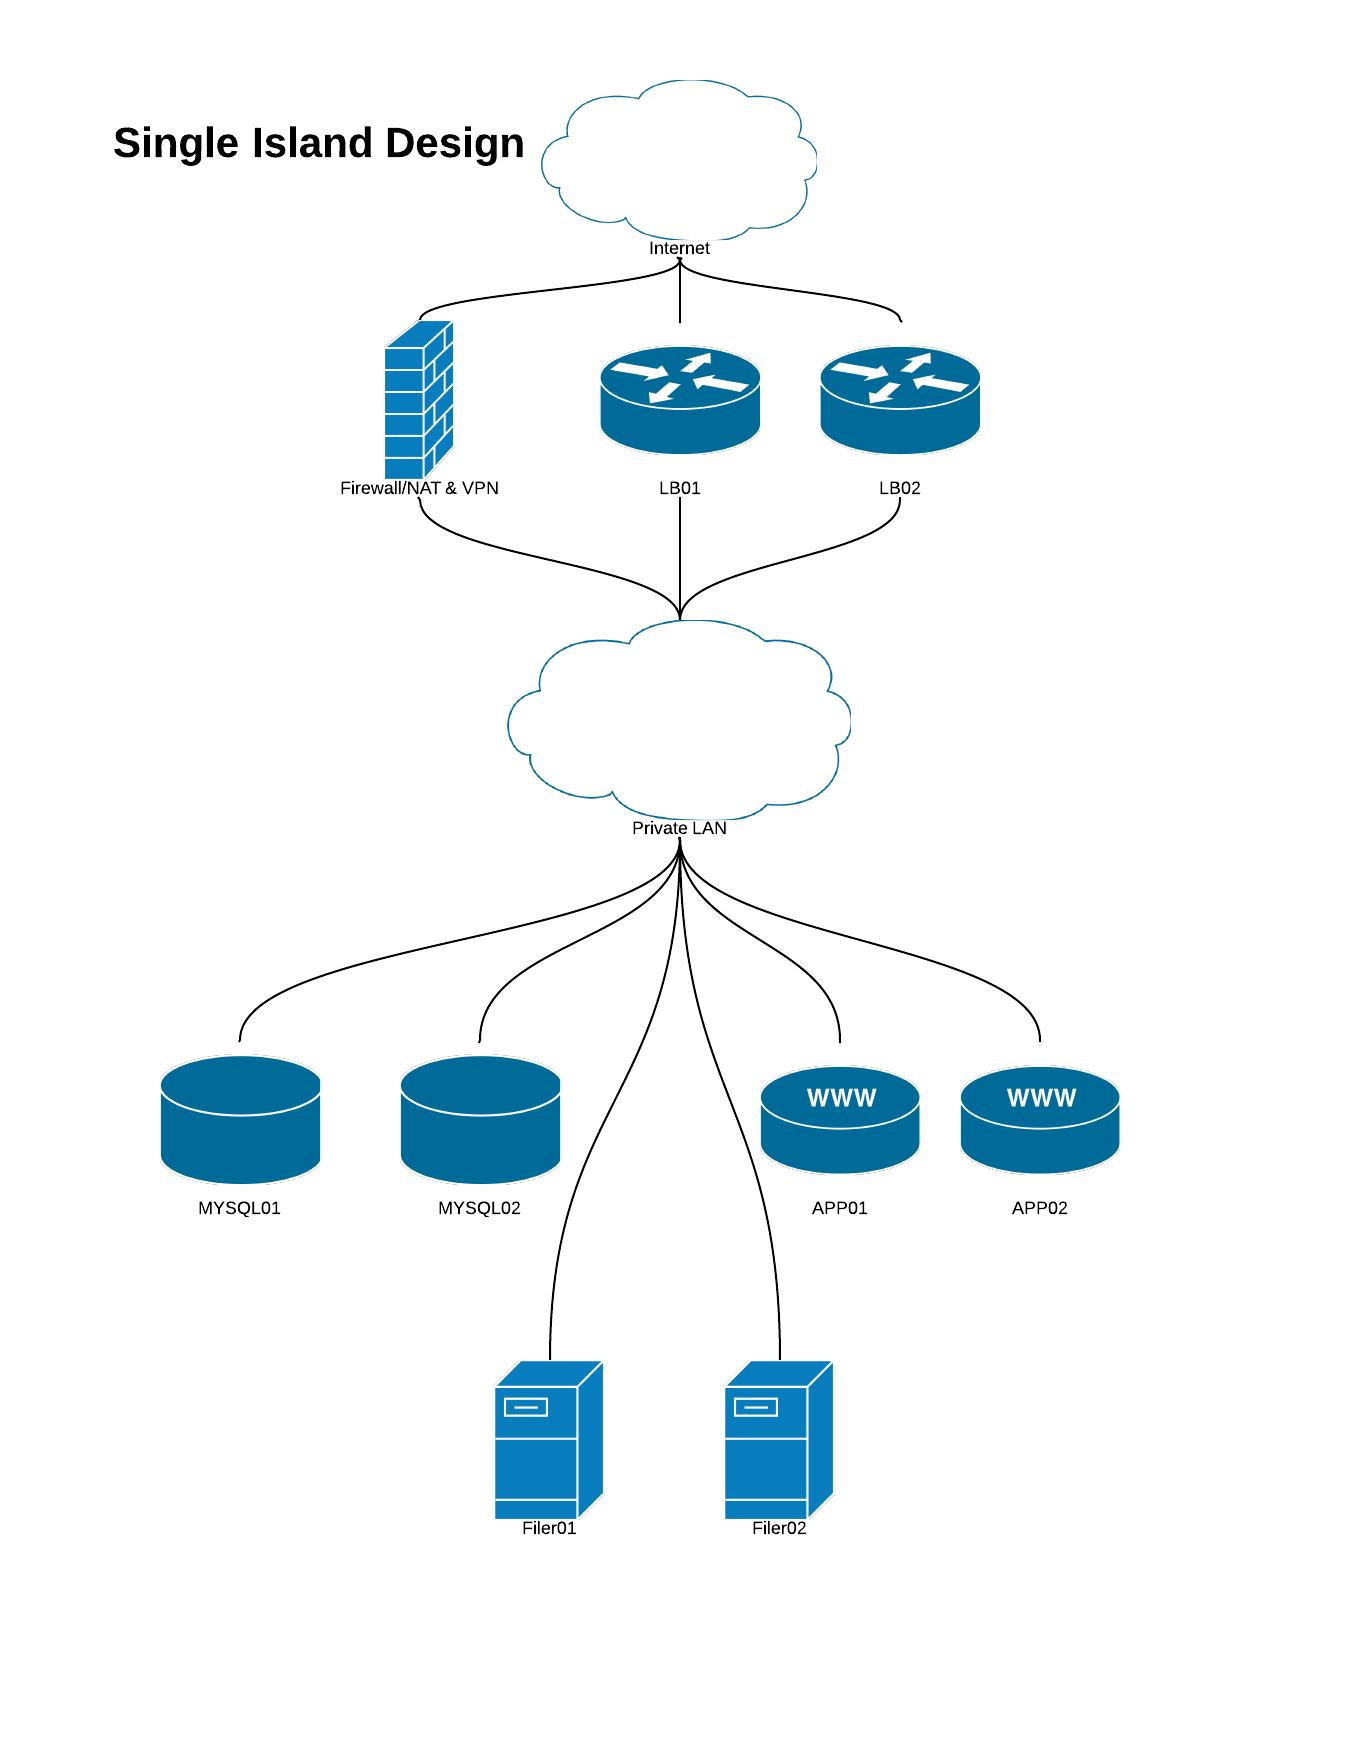 Project Titanicarus: Part 2 - Building the Servers